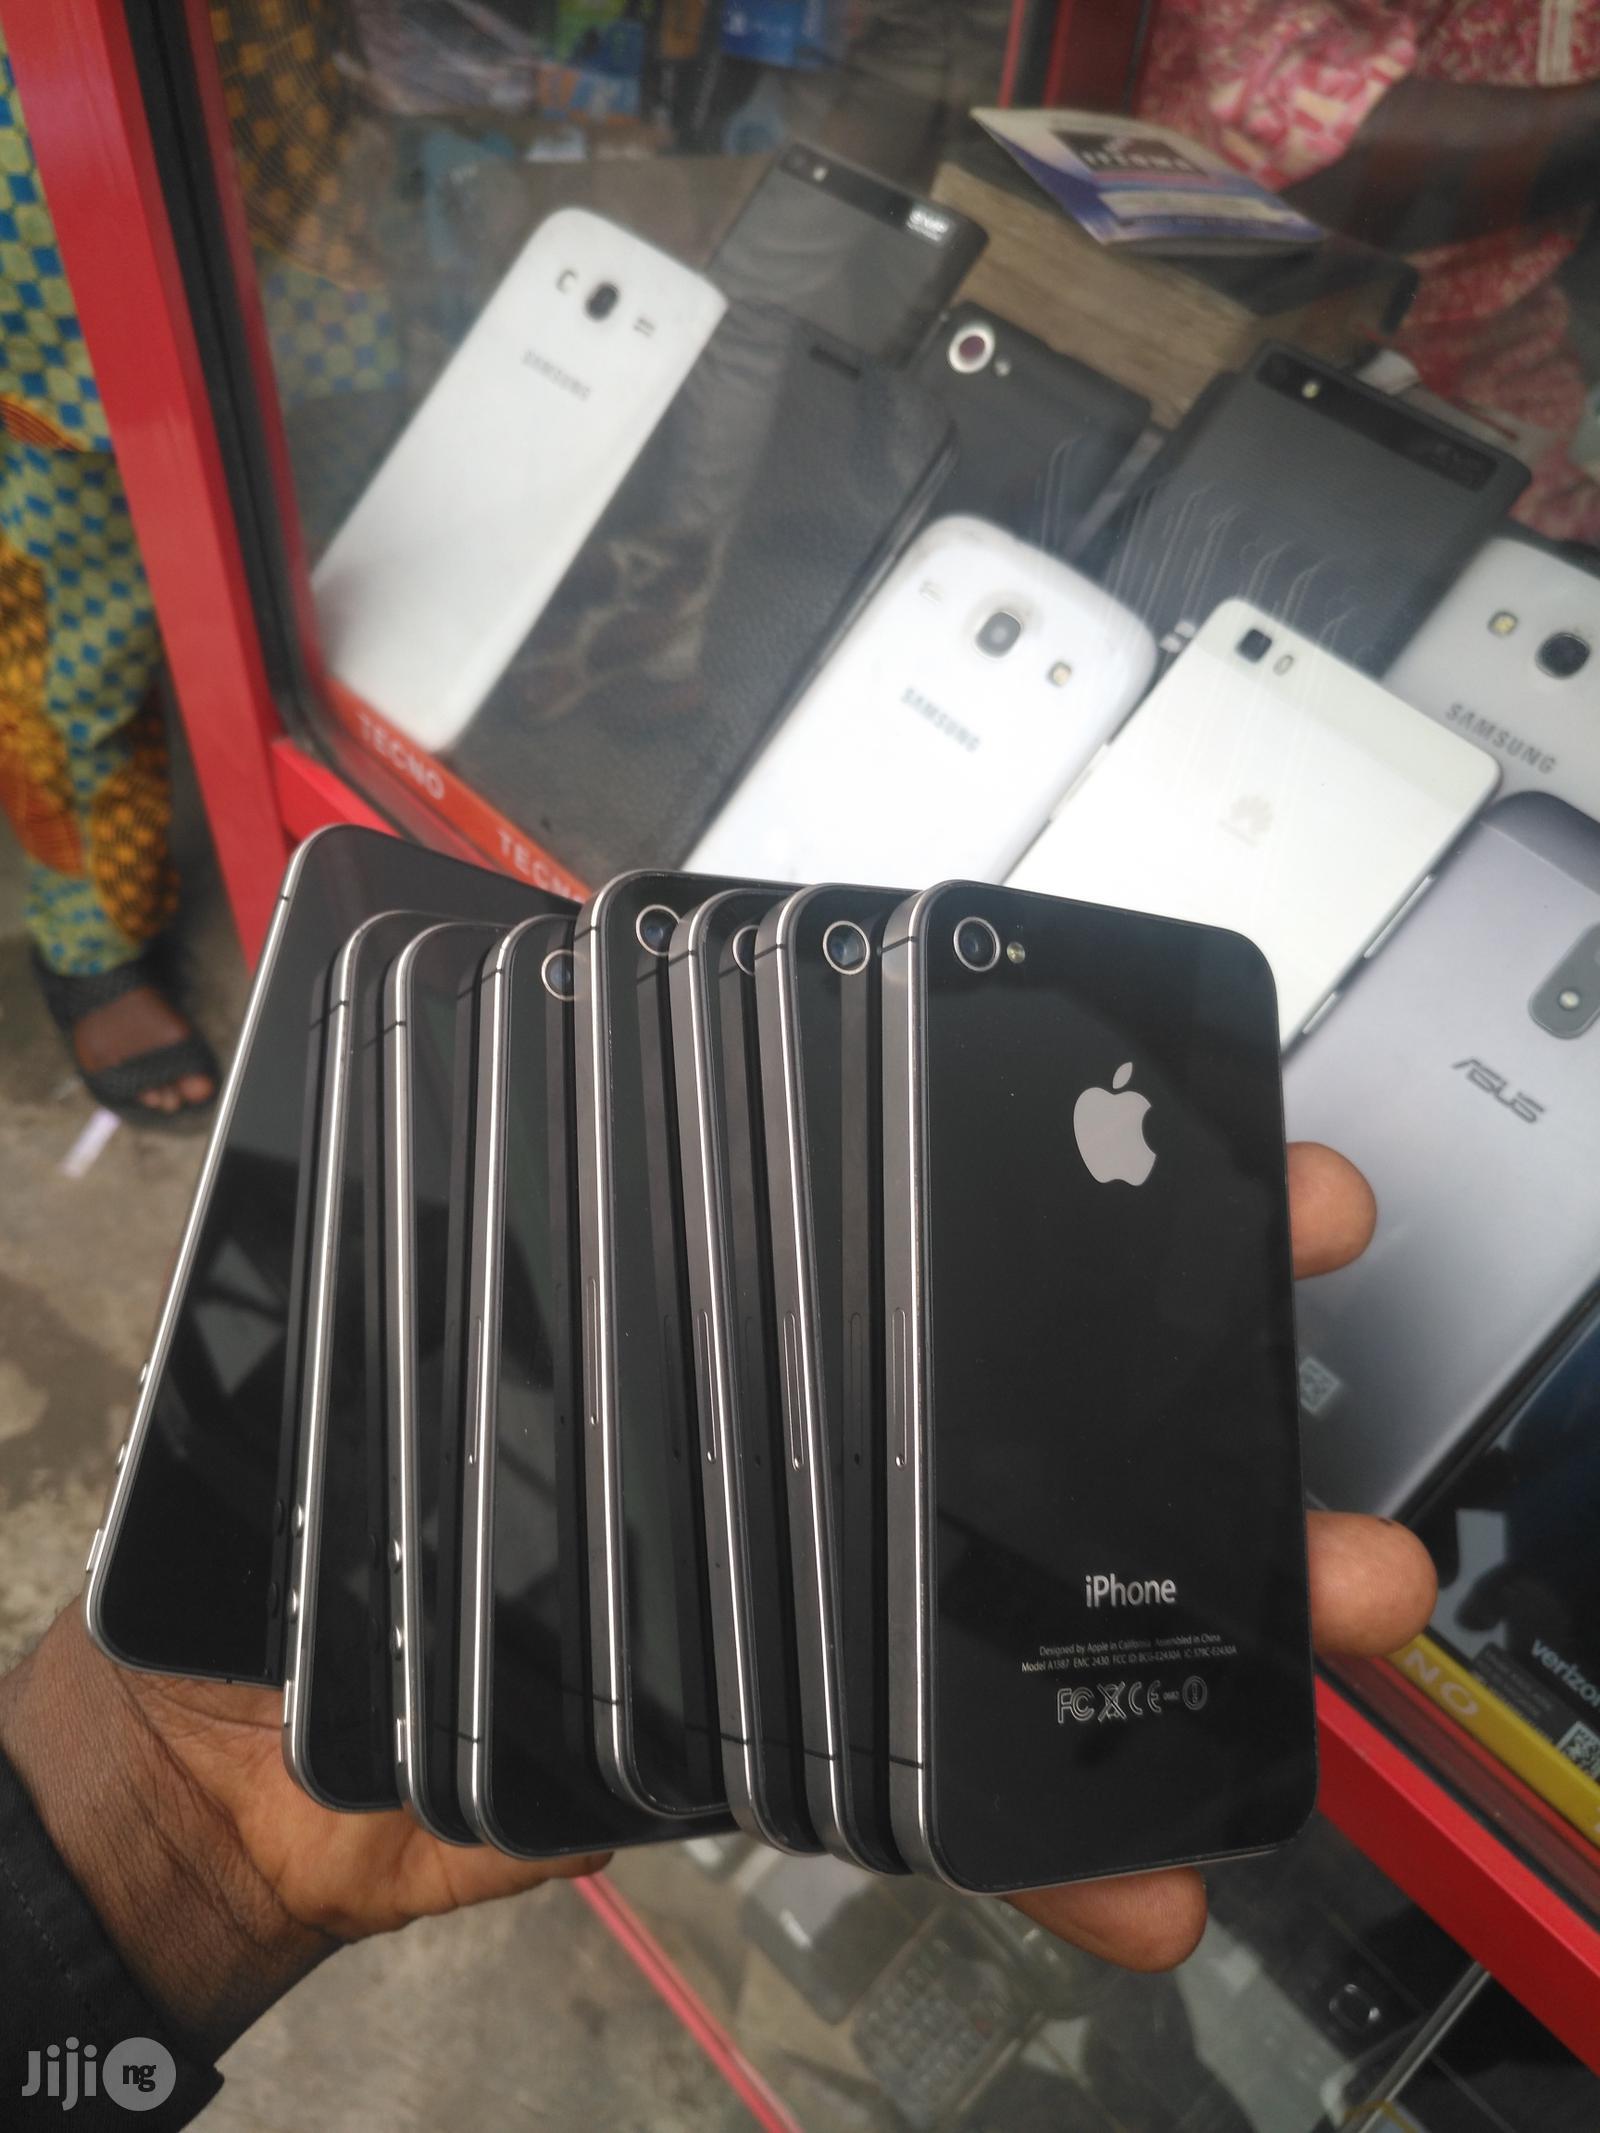 Apple iPhone 4s 16 GB | Mobile Phones for sale in Ikeja, Lagos State, Nigeria